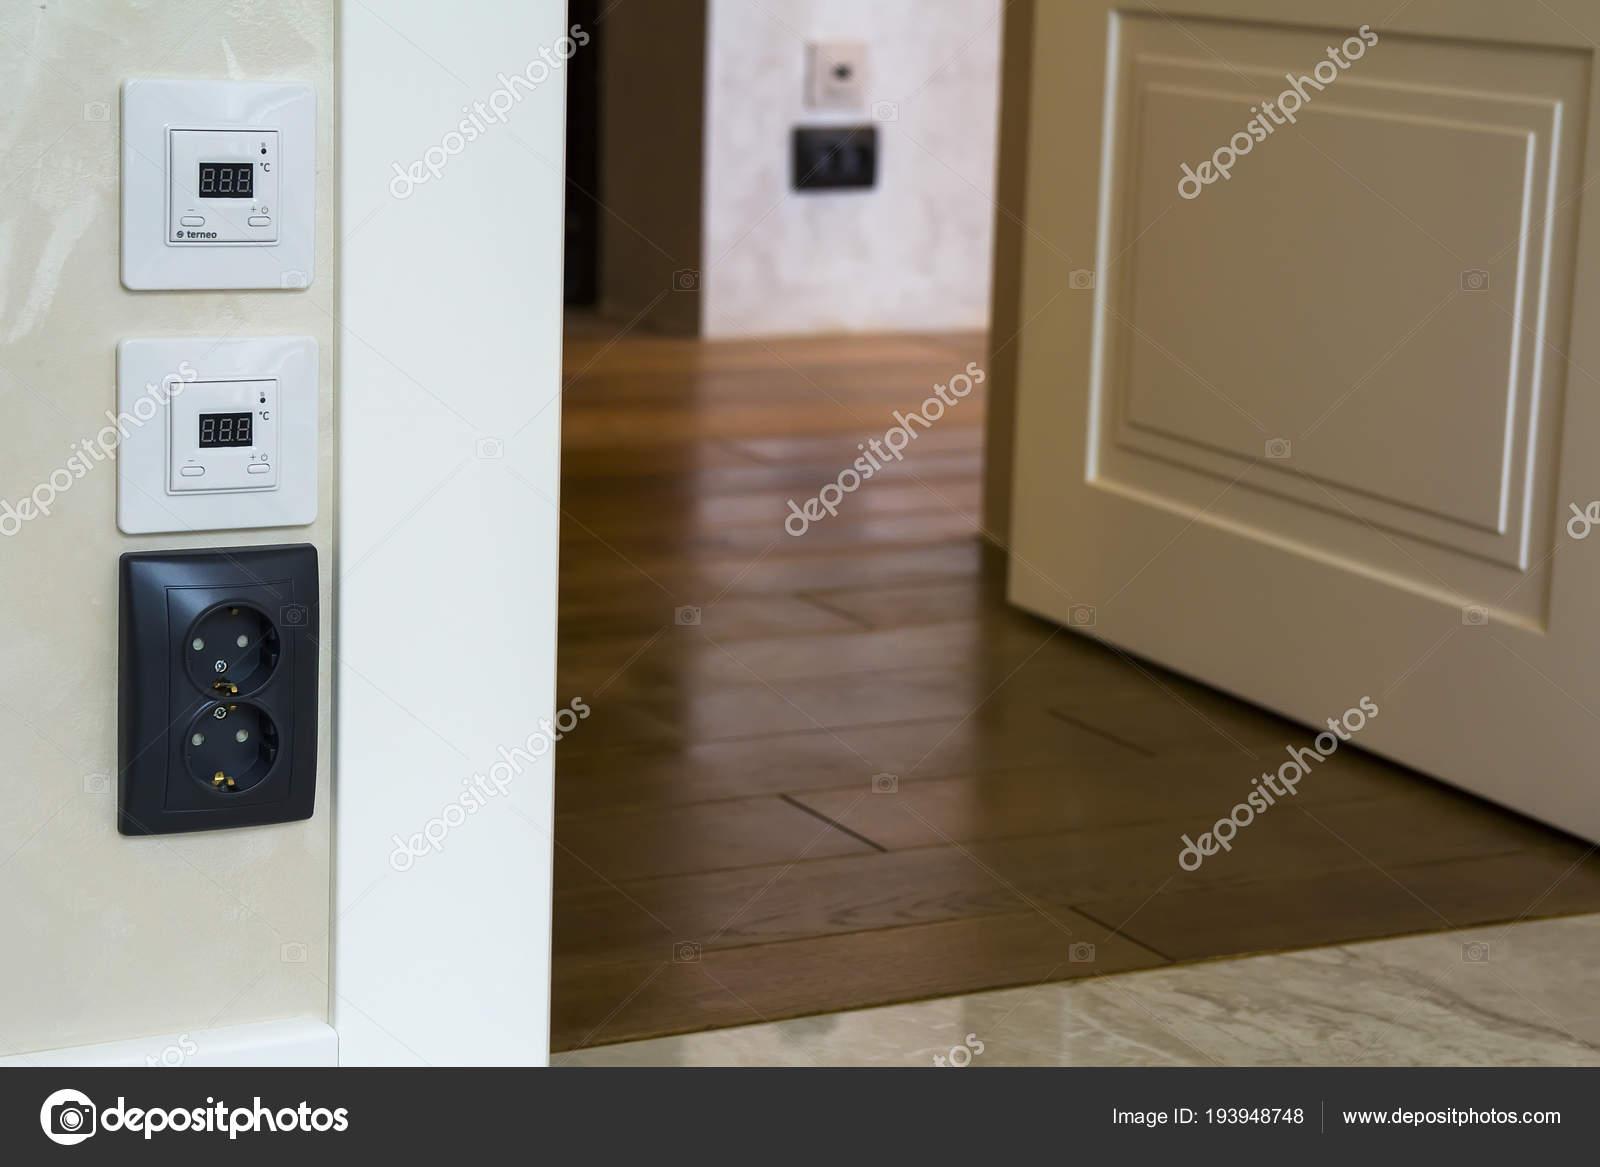 https://st3.depositphotos.com/7149852/19394/i/1600/depositphotos_193948748-stock-photo-modern-house-interior-with-warm.jpg